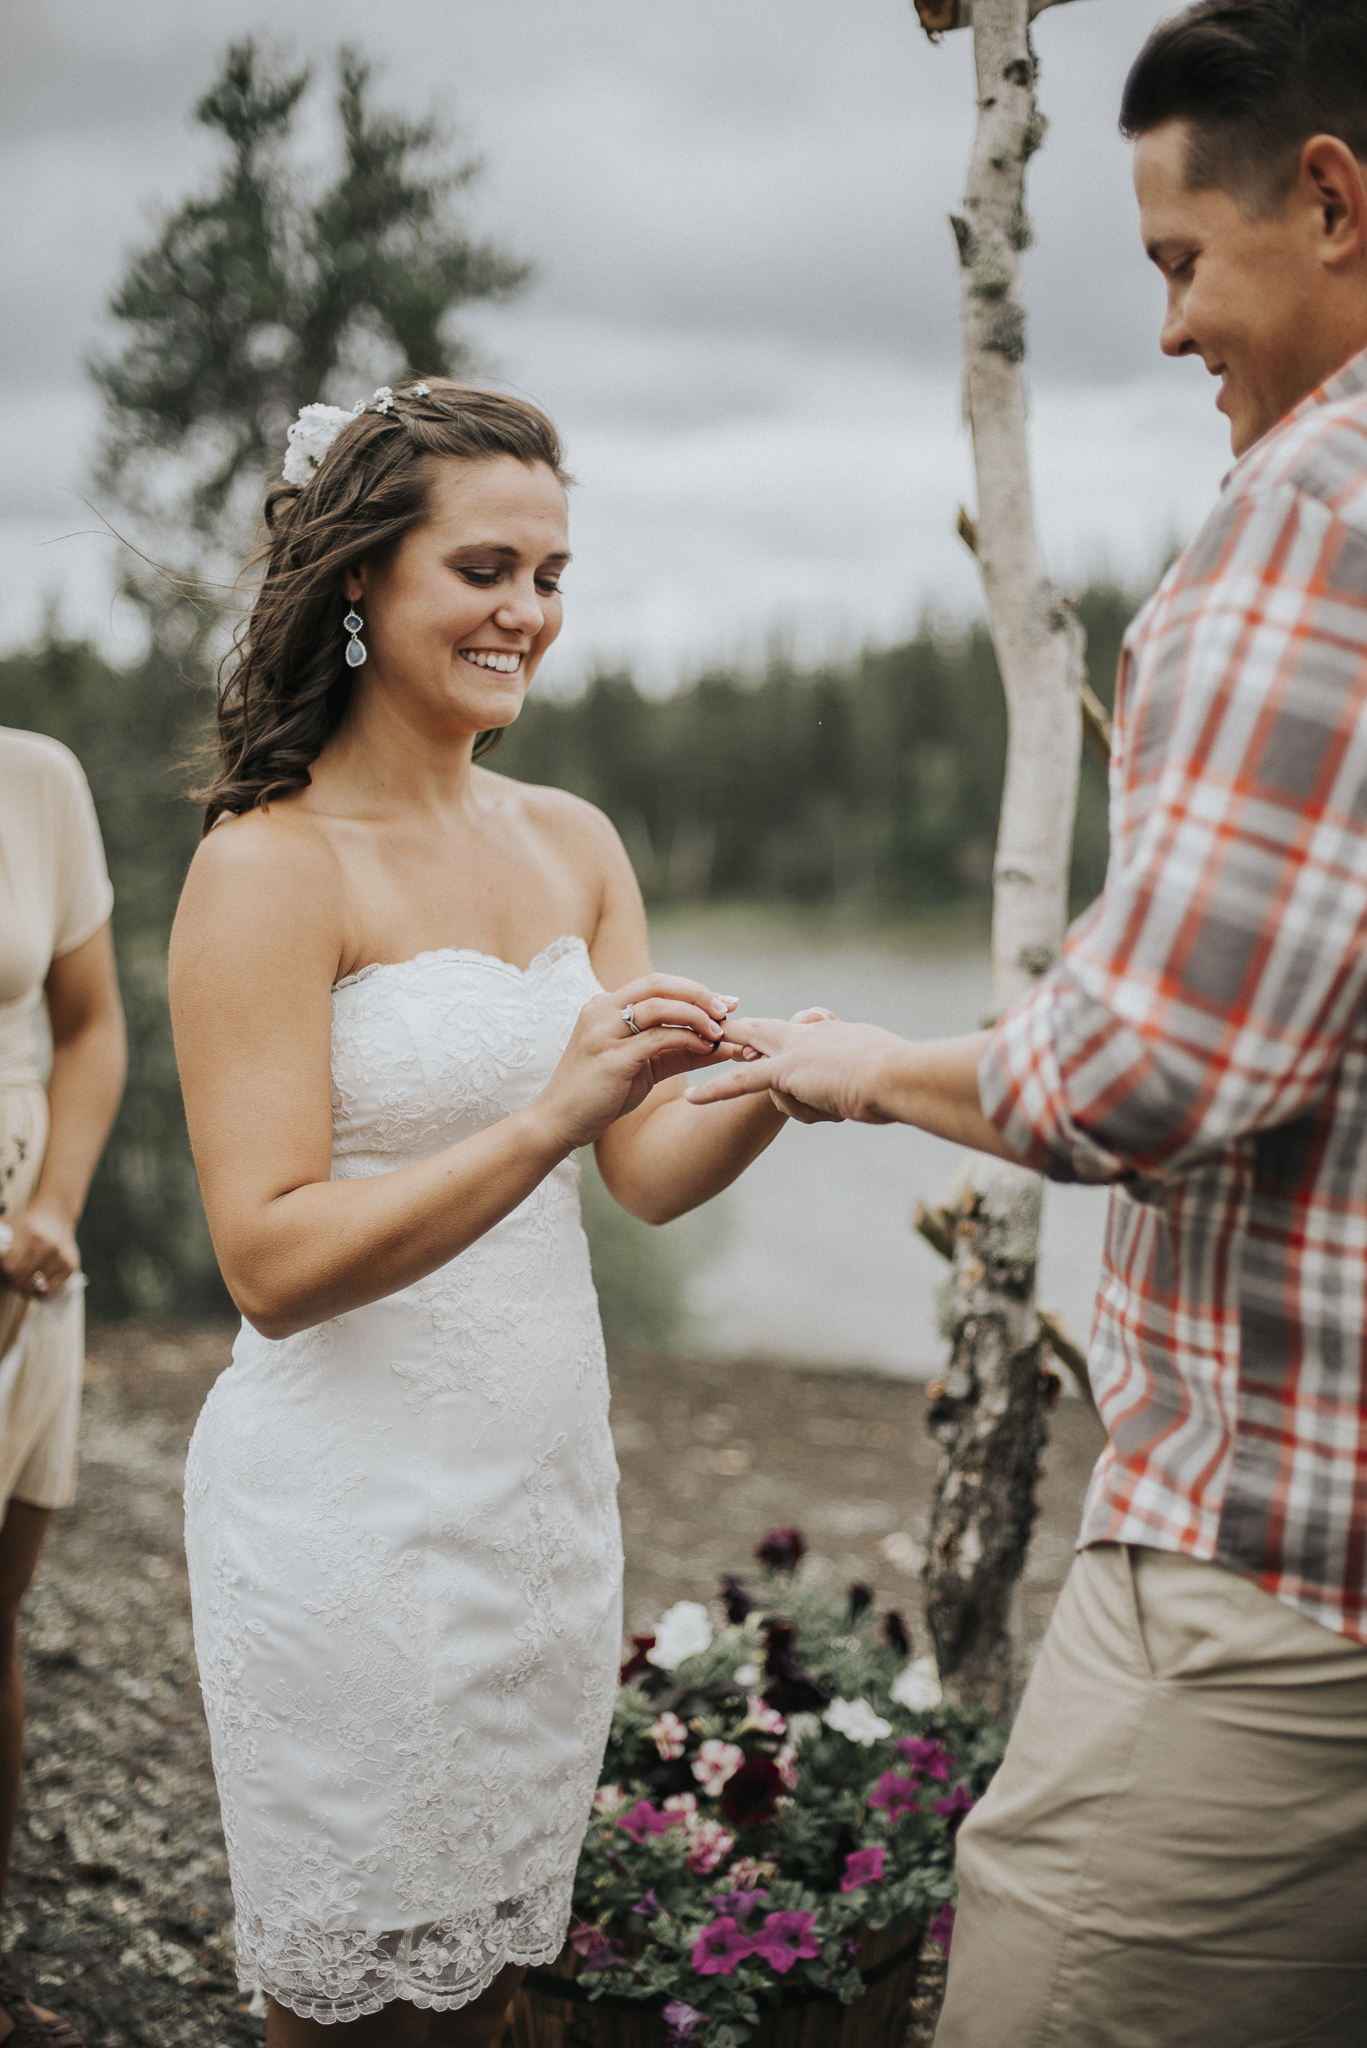 yellowknife wedding photographer5.jpg